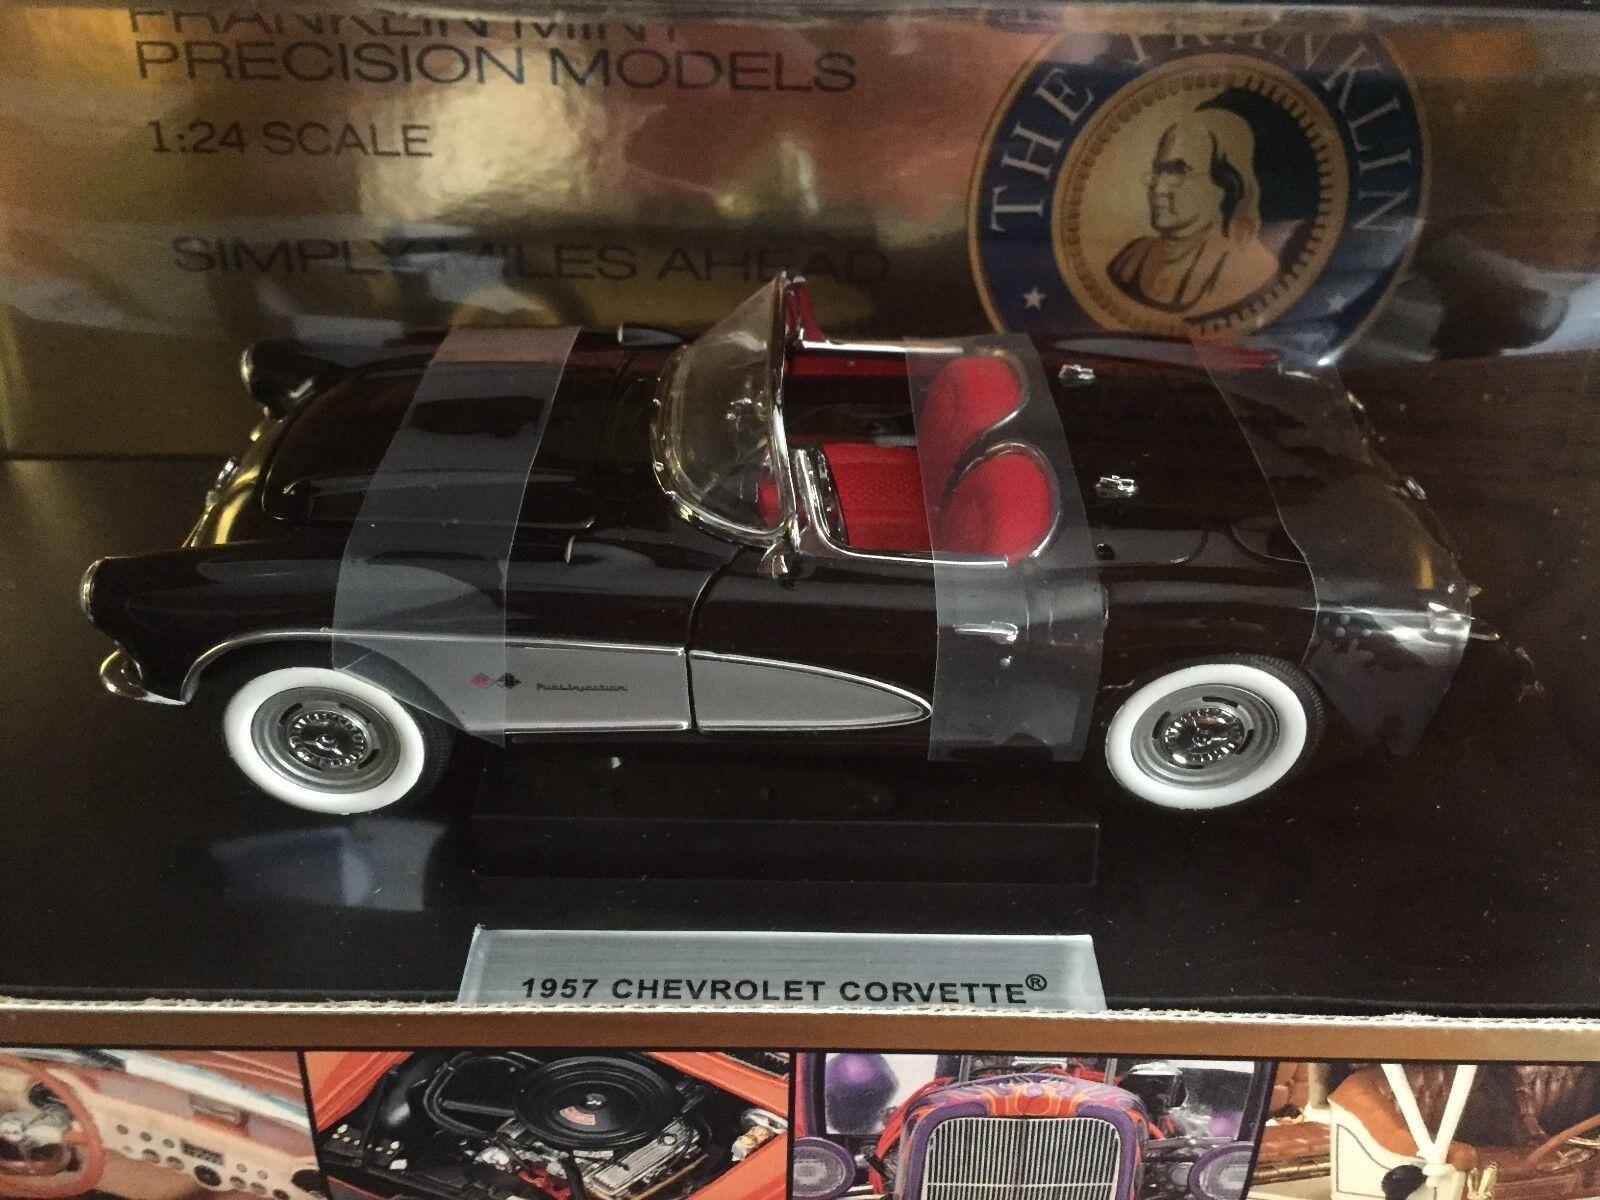 ahorra hasta un 80% 1957 Corvette Roadster-Franklin Mint-Nuevo Caja Caja Caja  para proporcionarle una compra en línea agradable